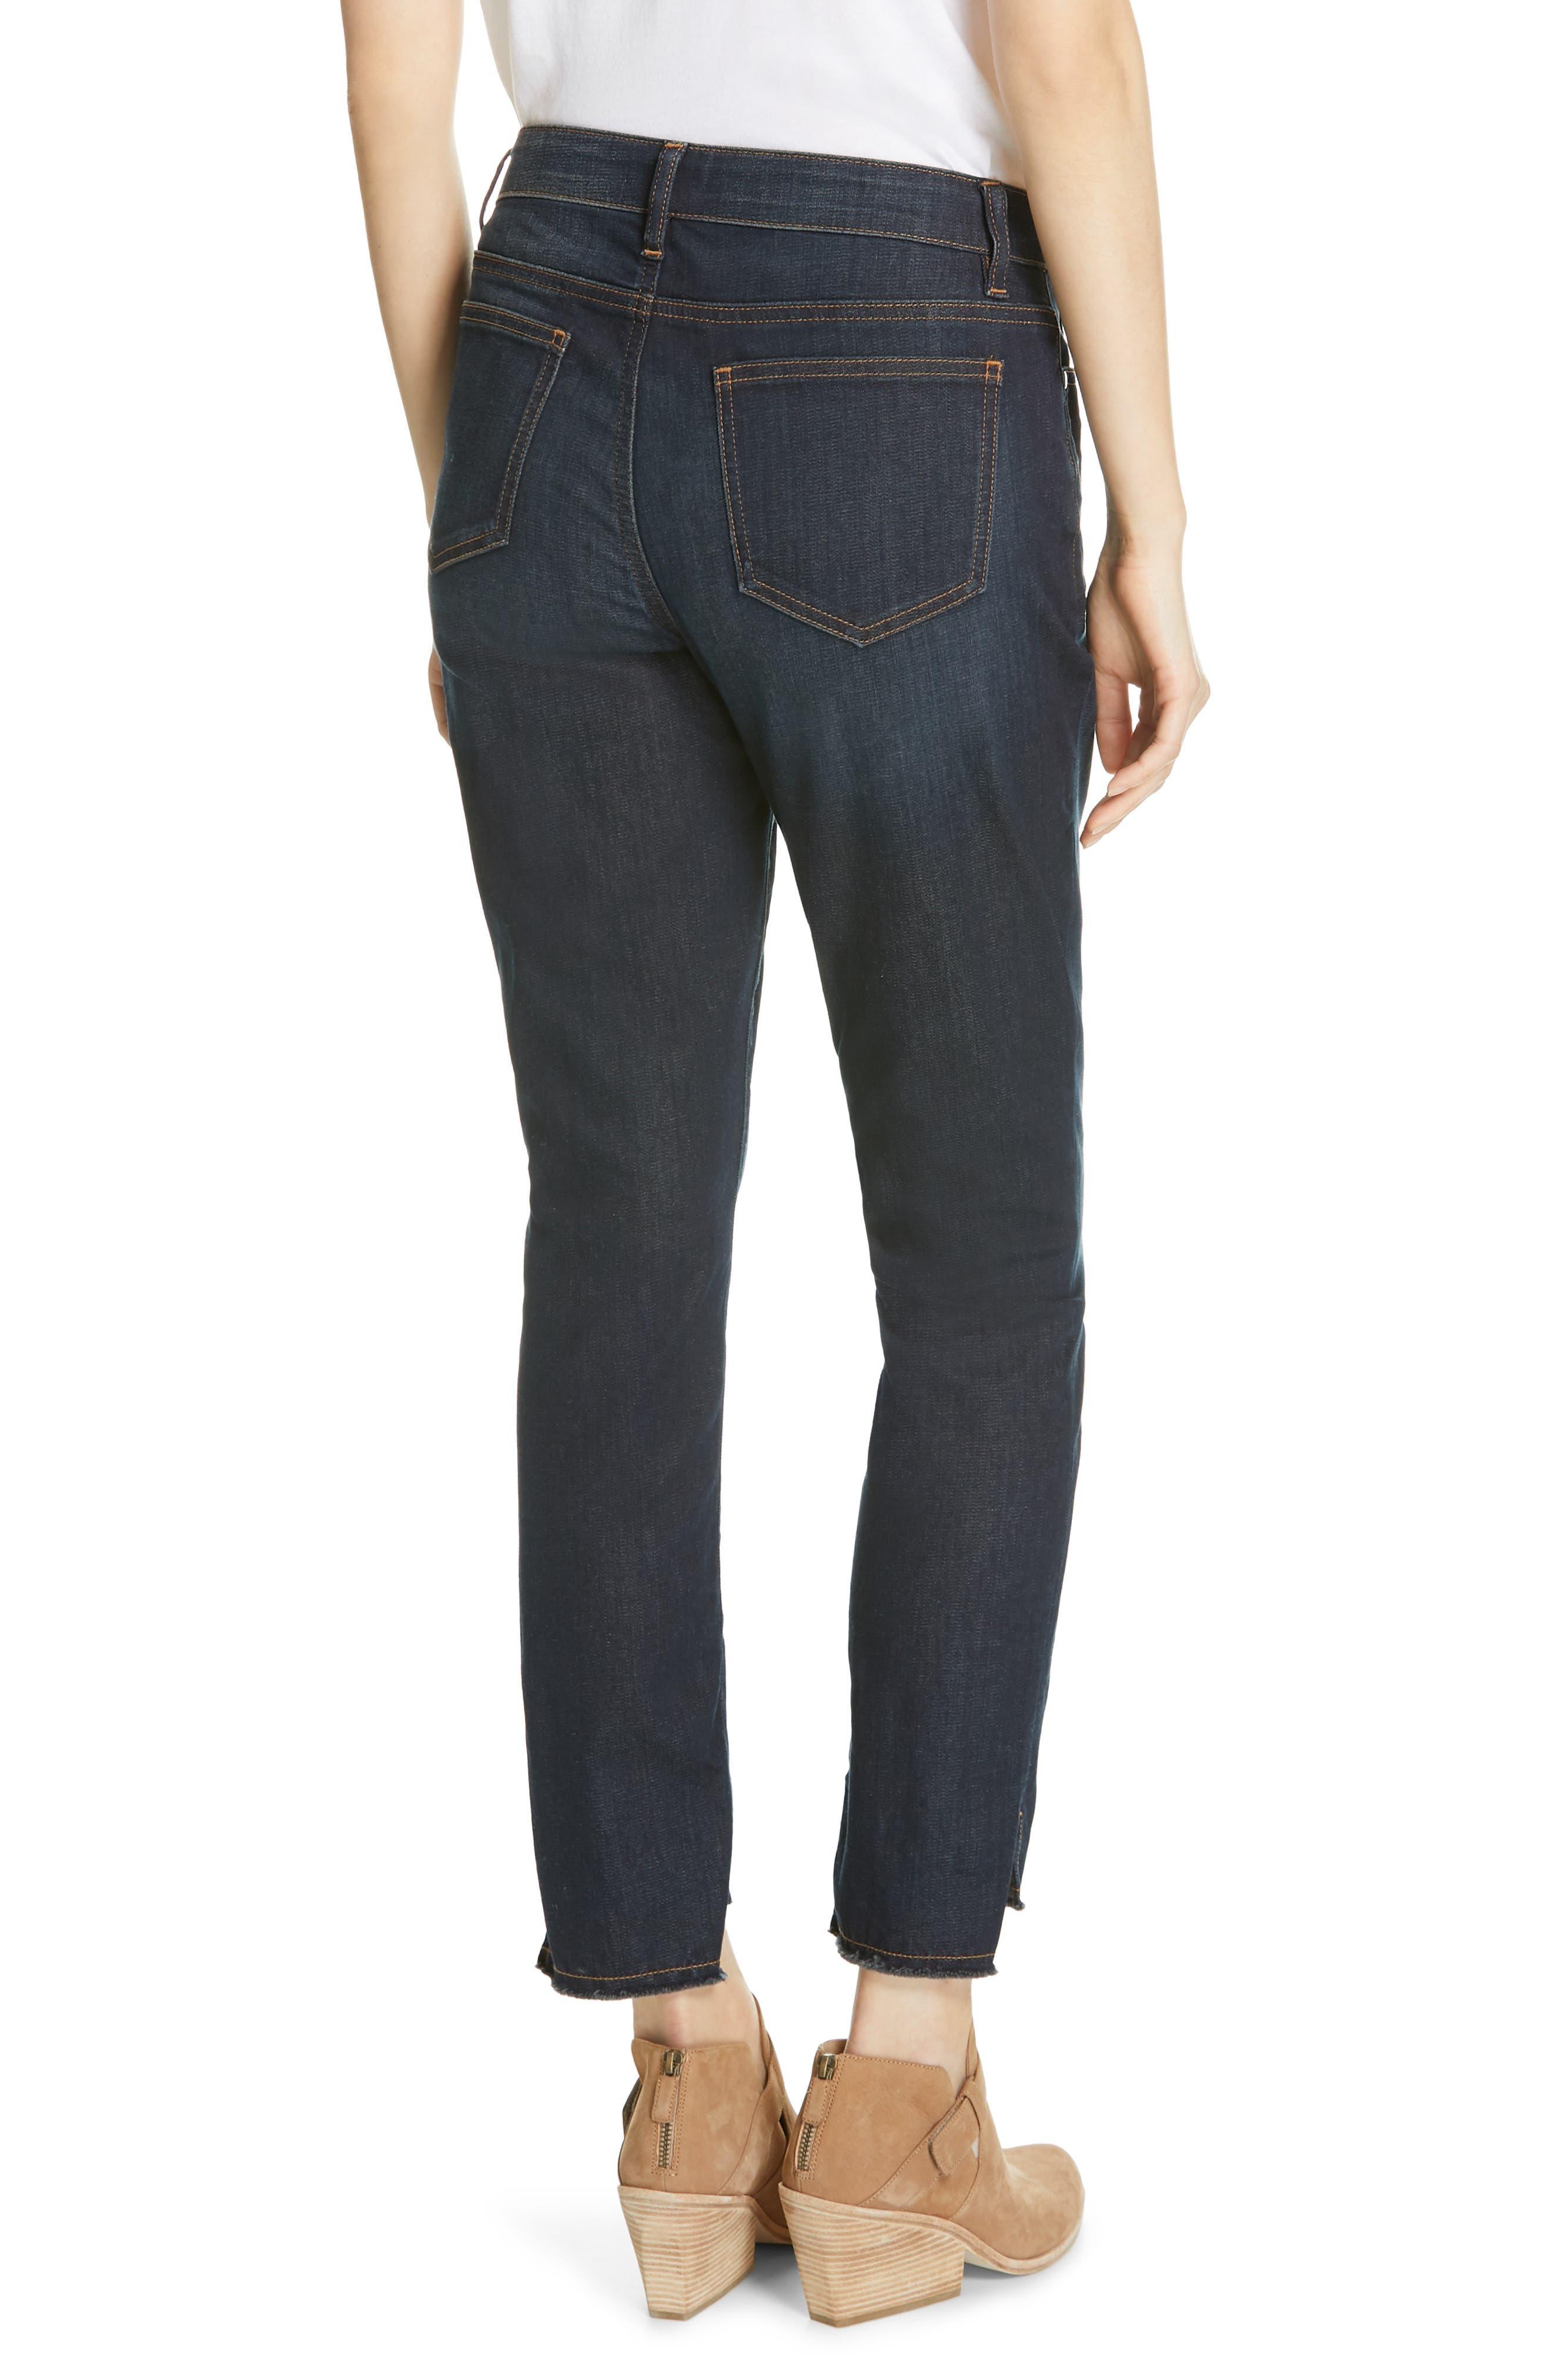 EILEEN FISHER, Raw Step Hem Slim Ankle Jeans, Alternate thumbnail 2, color, UTILITY BLUE